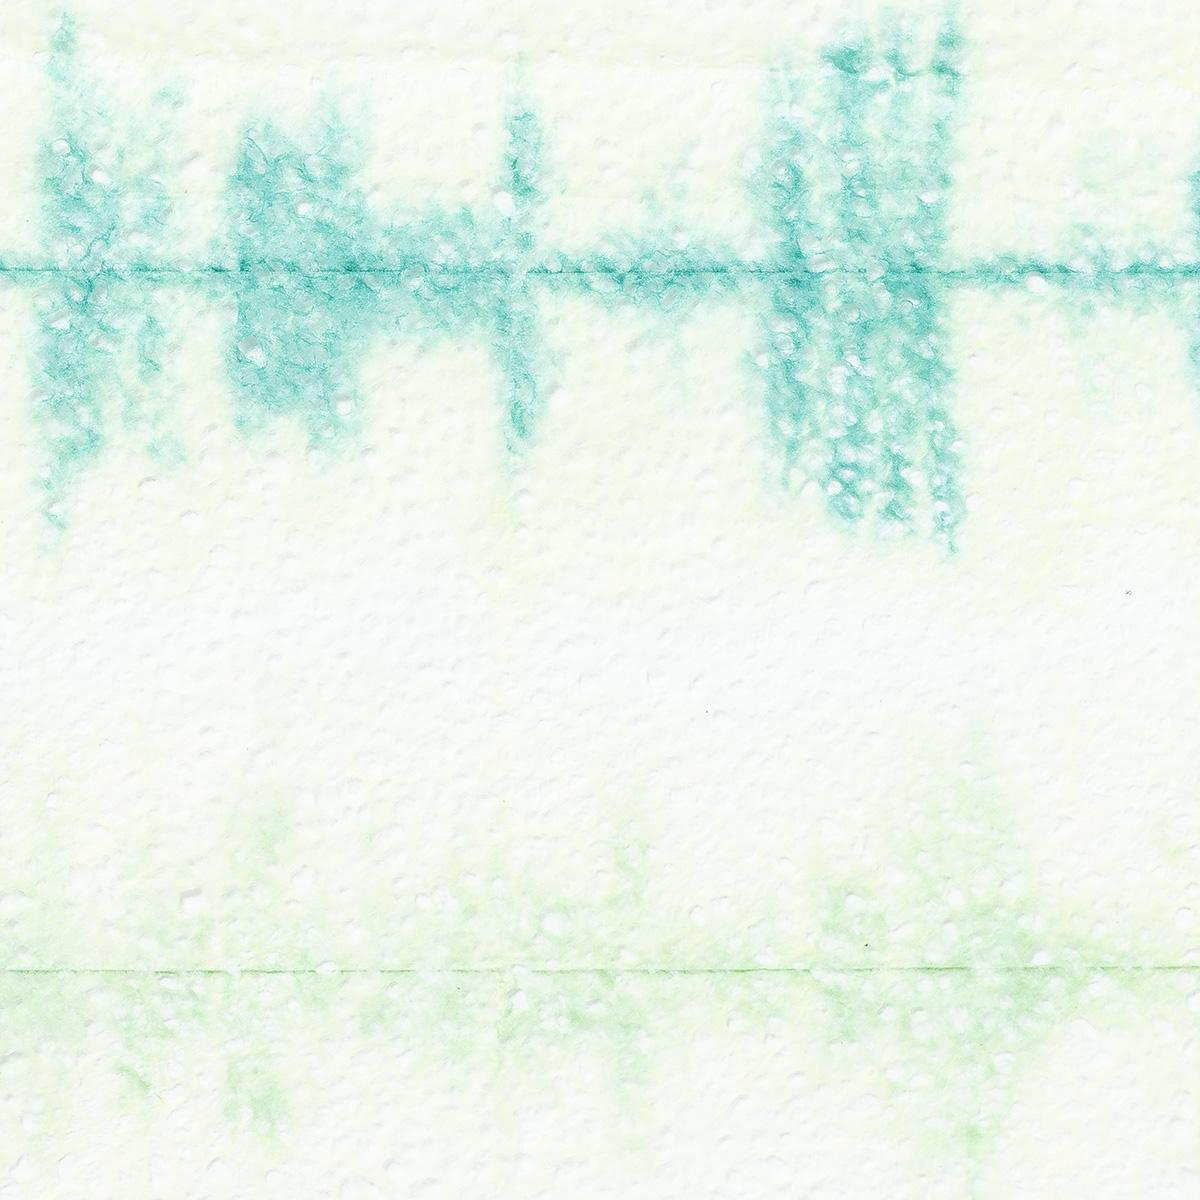 落水紙(春雨)板締め No.7